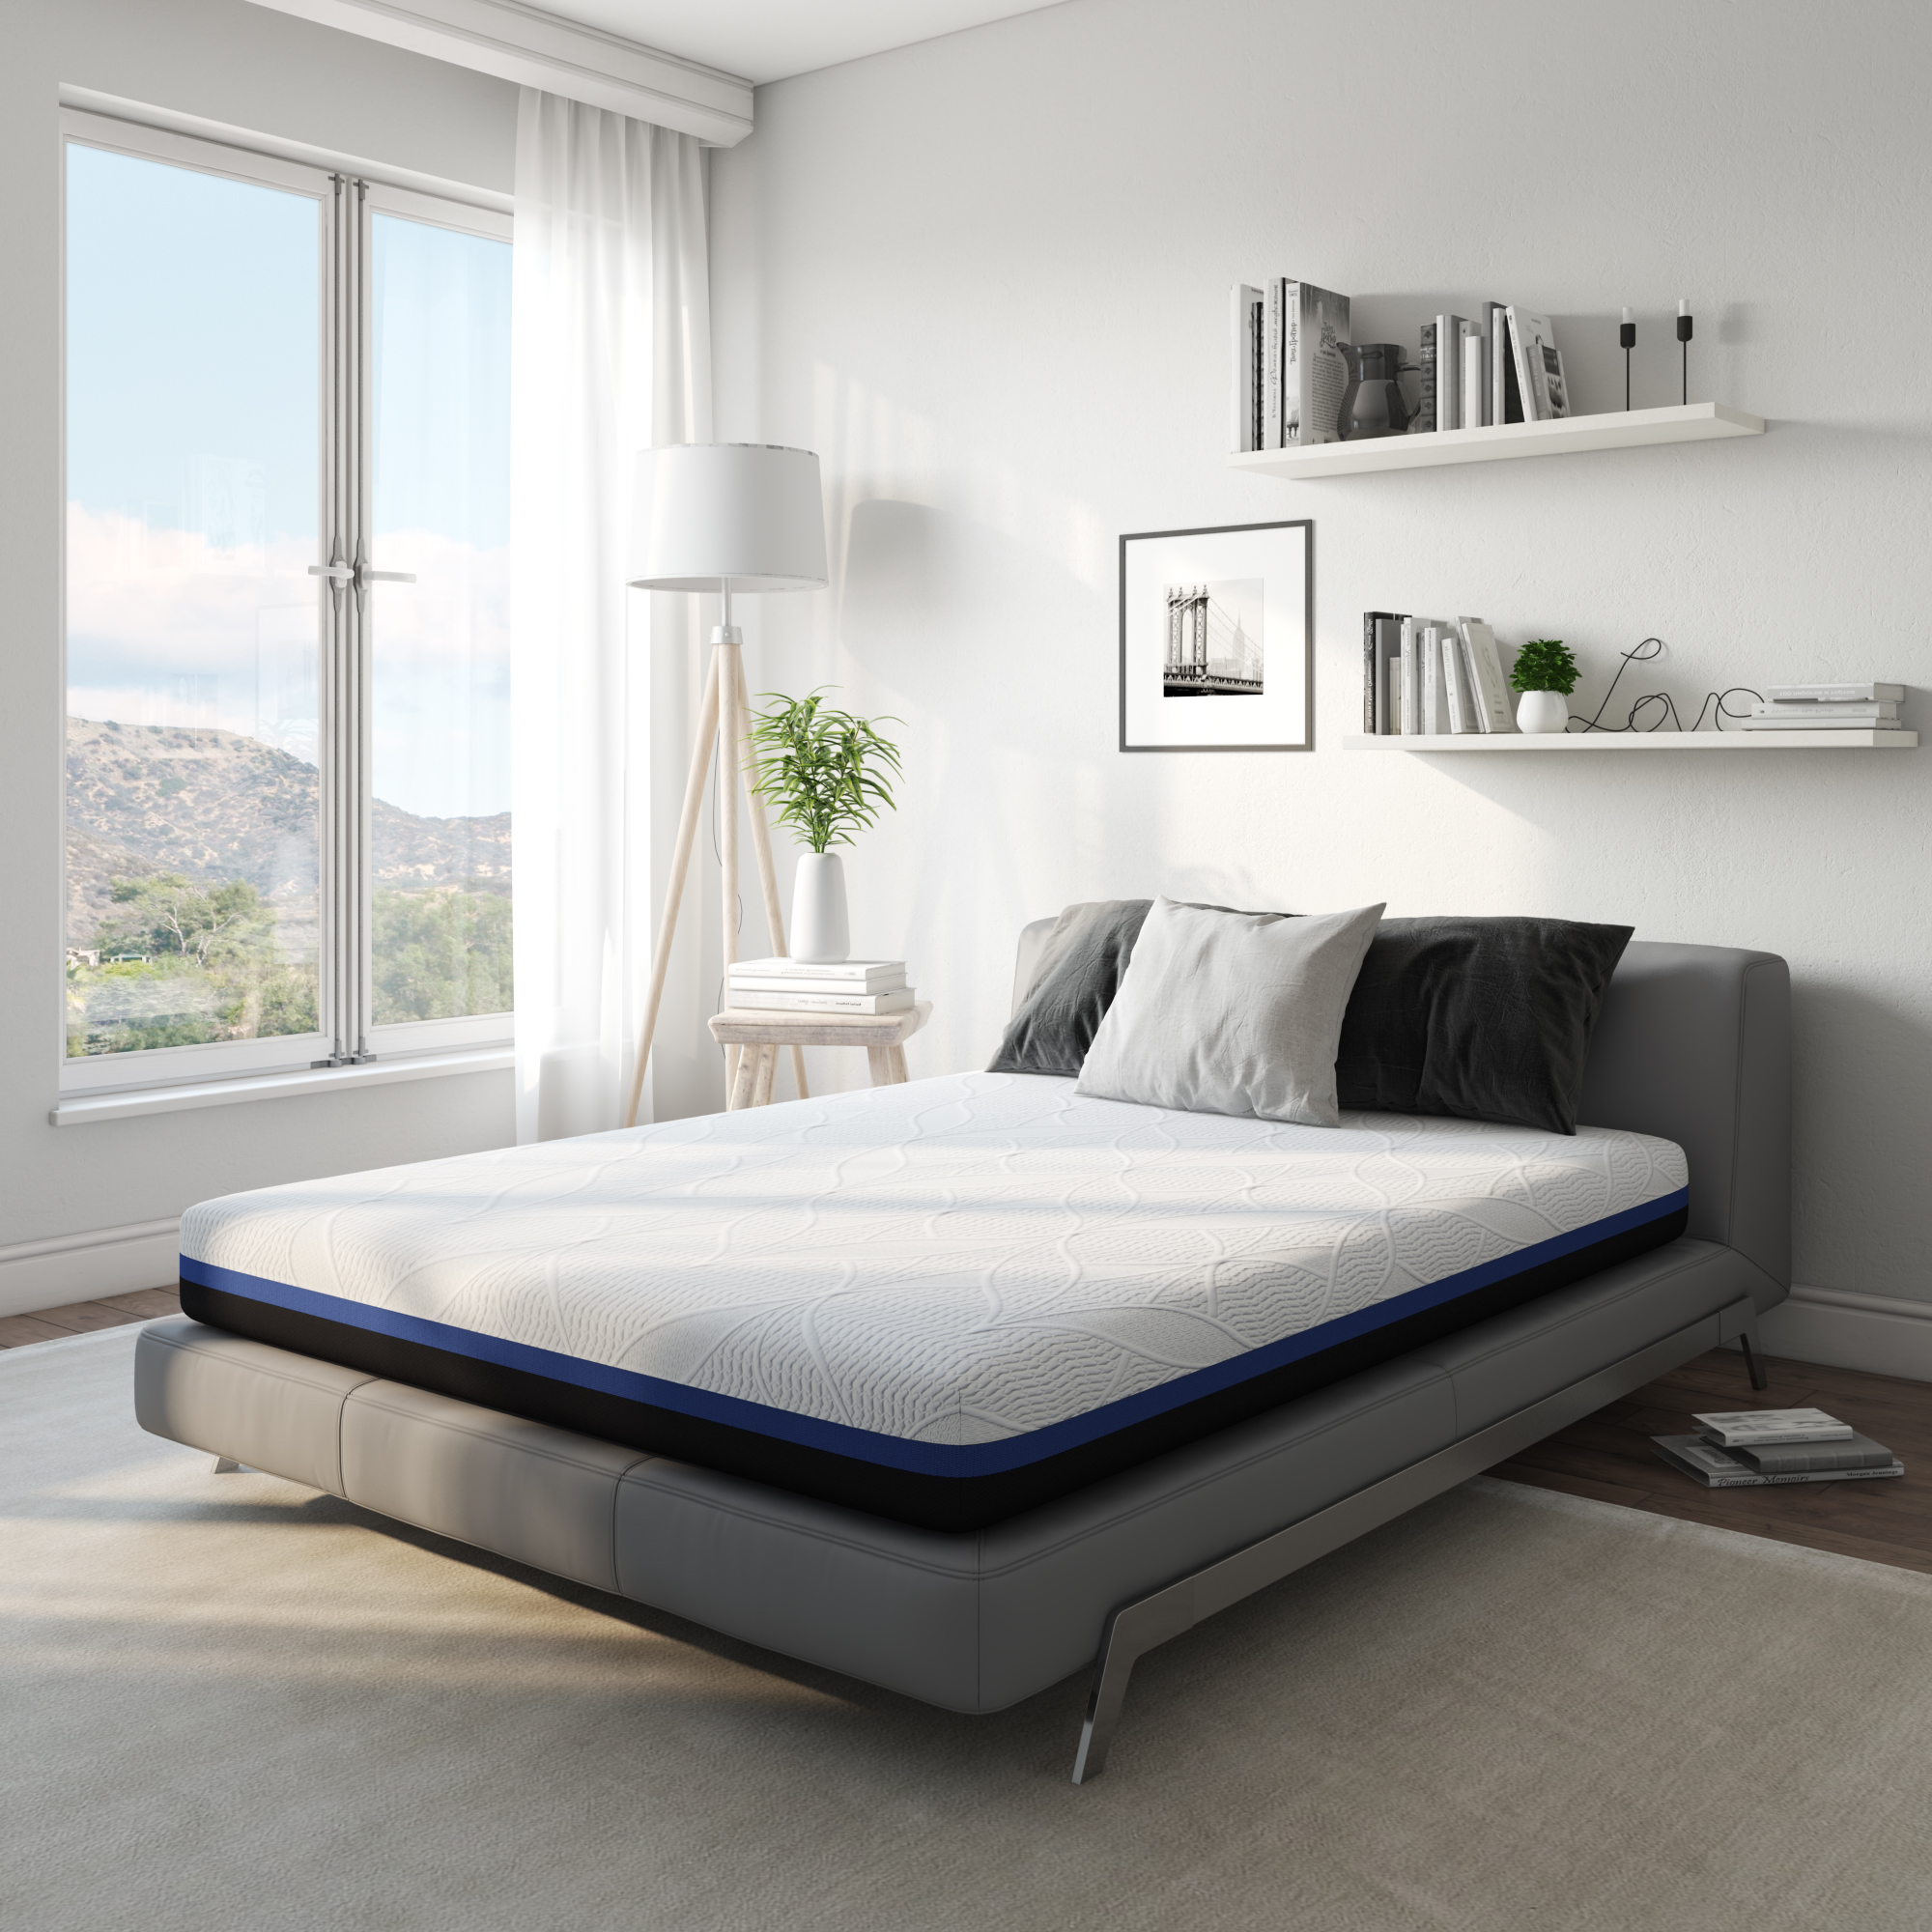 Modern Sleep Surrey Hybrid Gel Memory Foam and Innerspring 12-Inch Mattress, Multiple Sizes